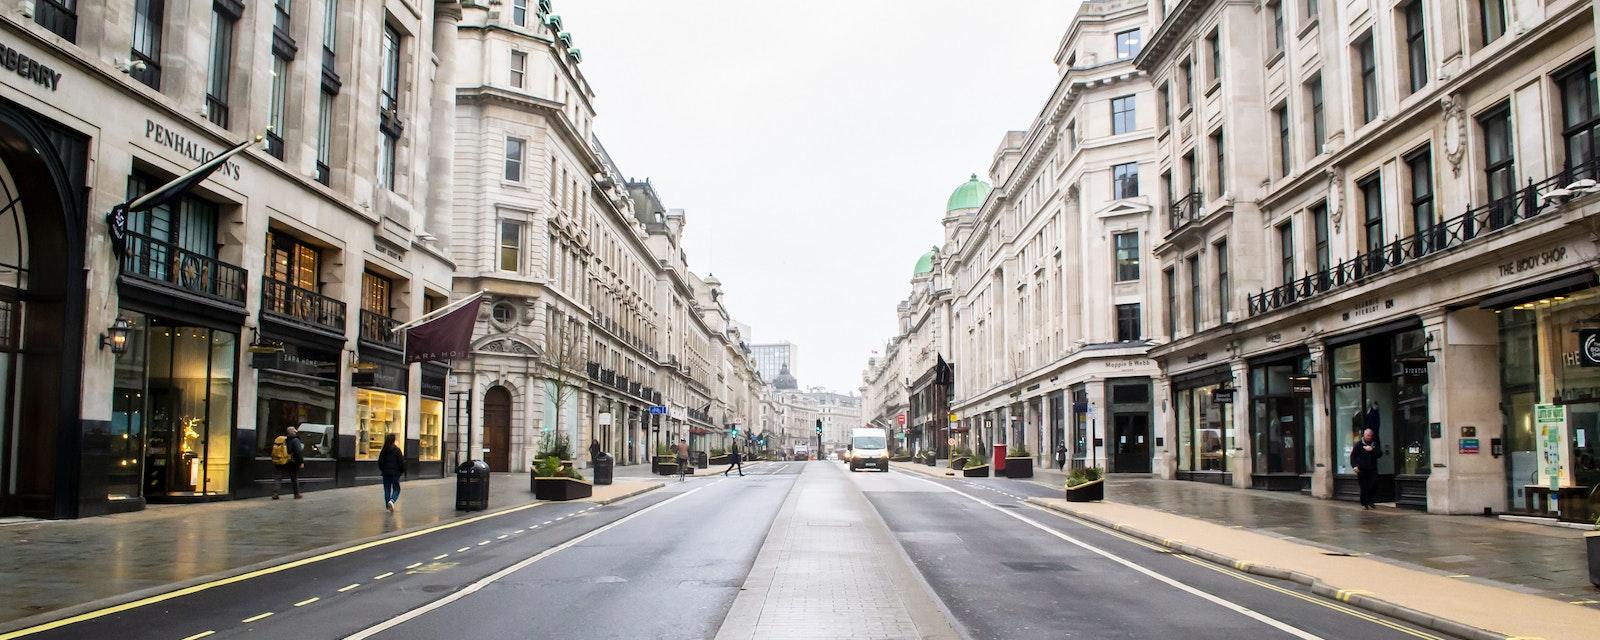 Regent,Street,,London,,England-,17th,February,2021:,A,Quiet,Regent